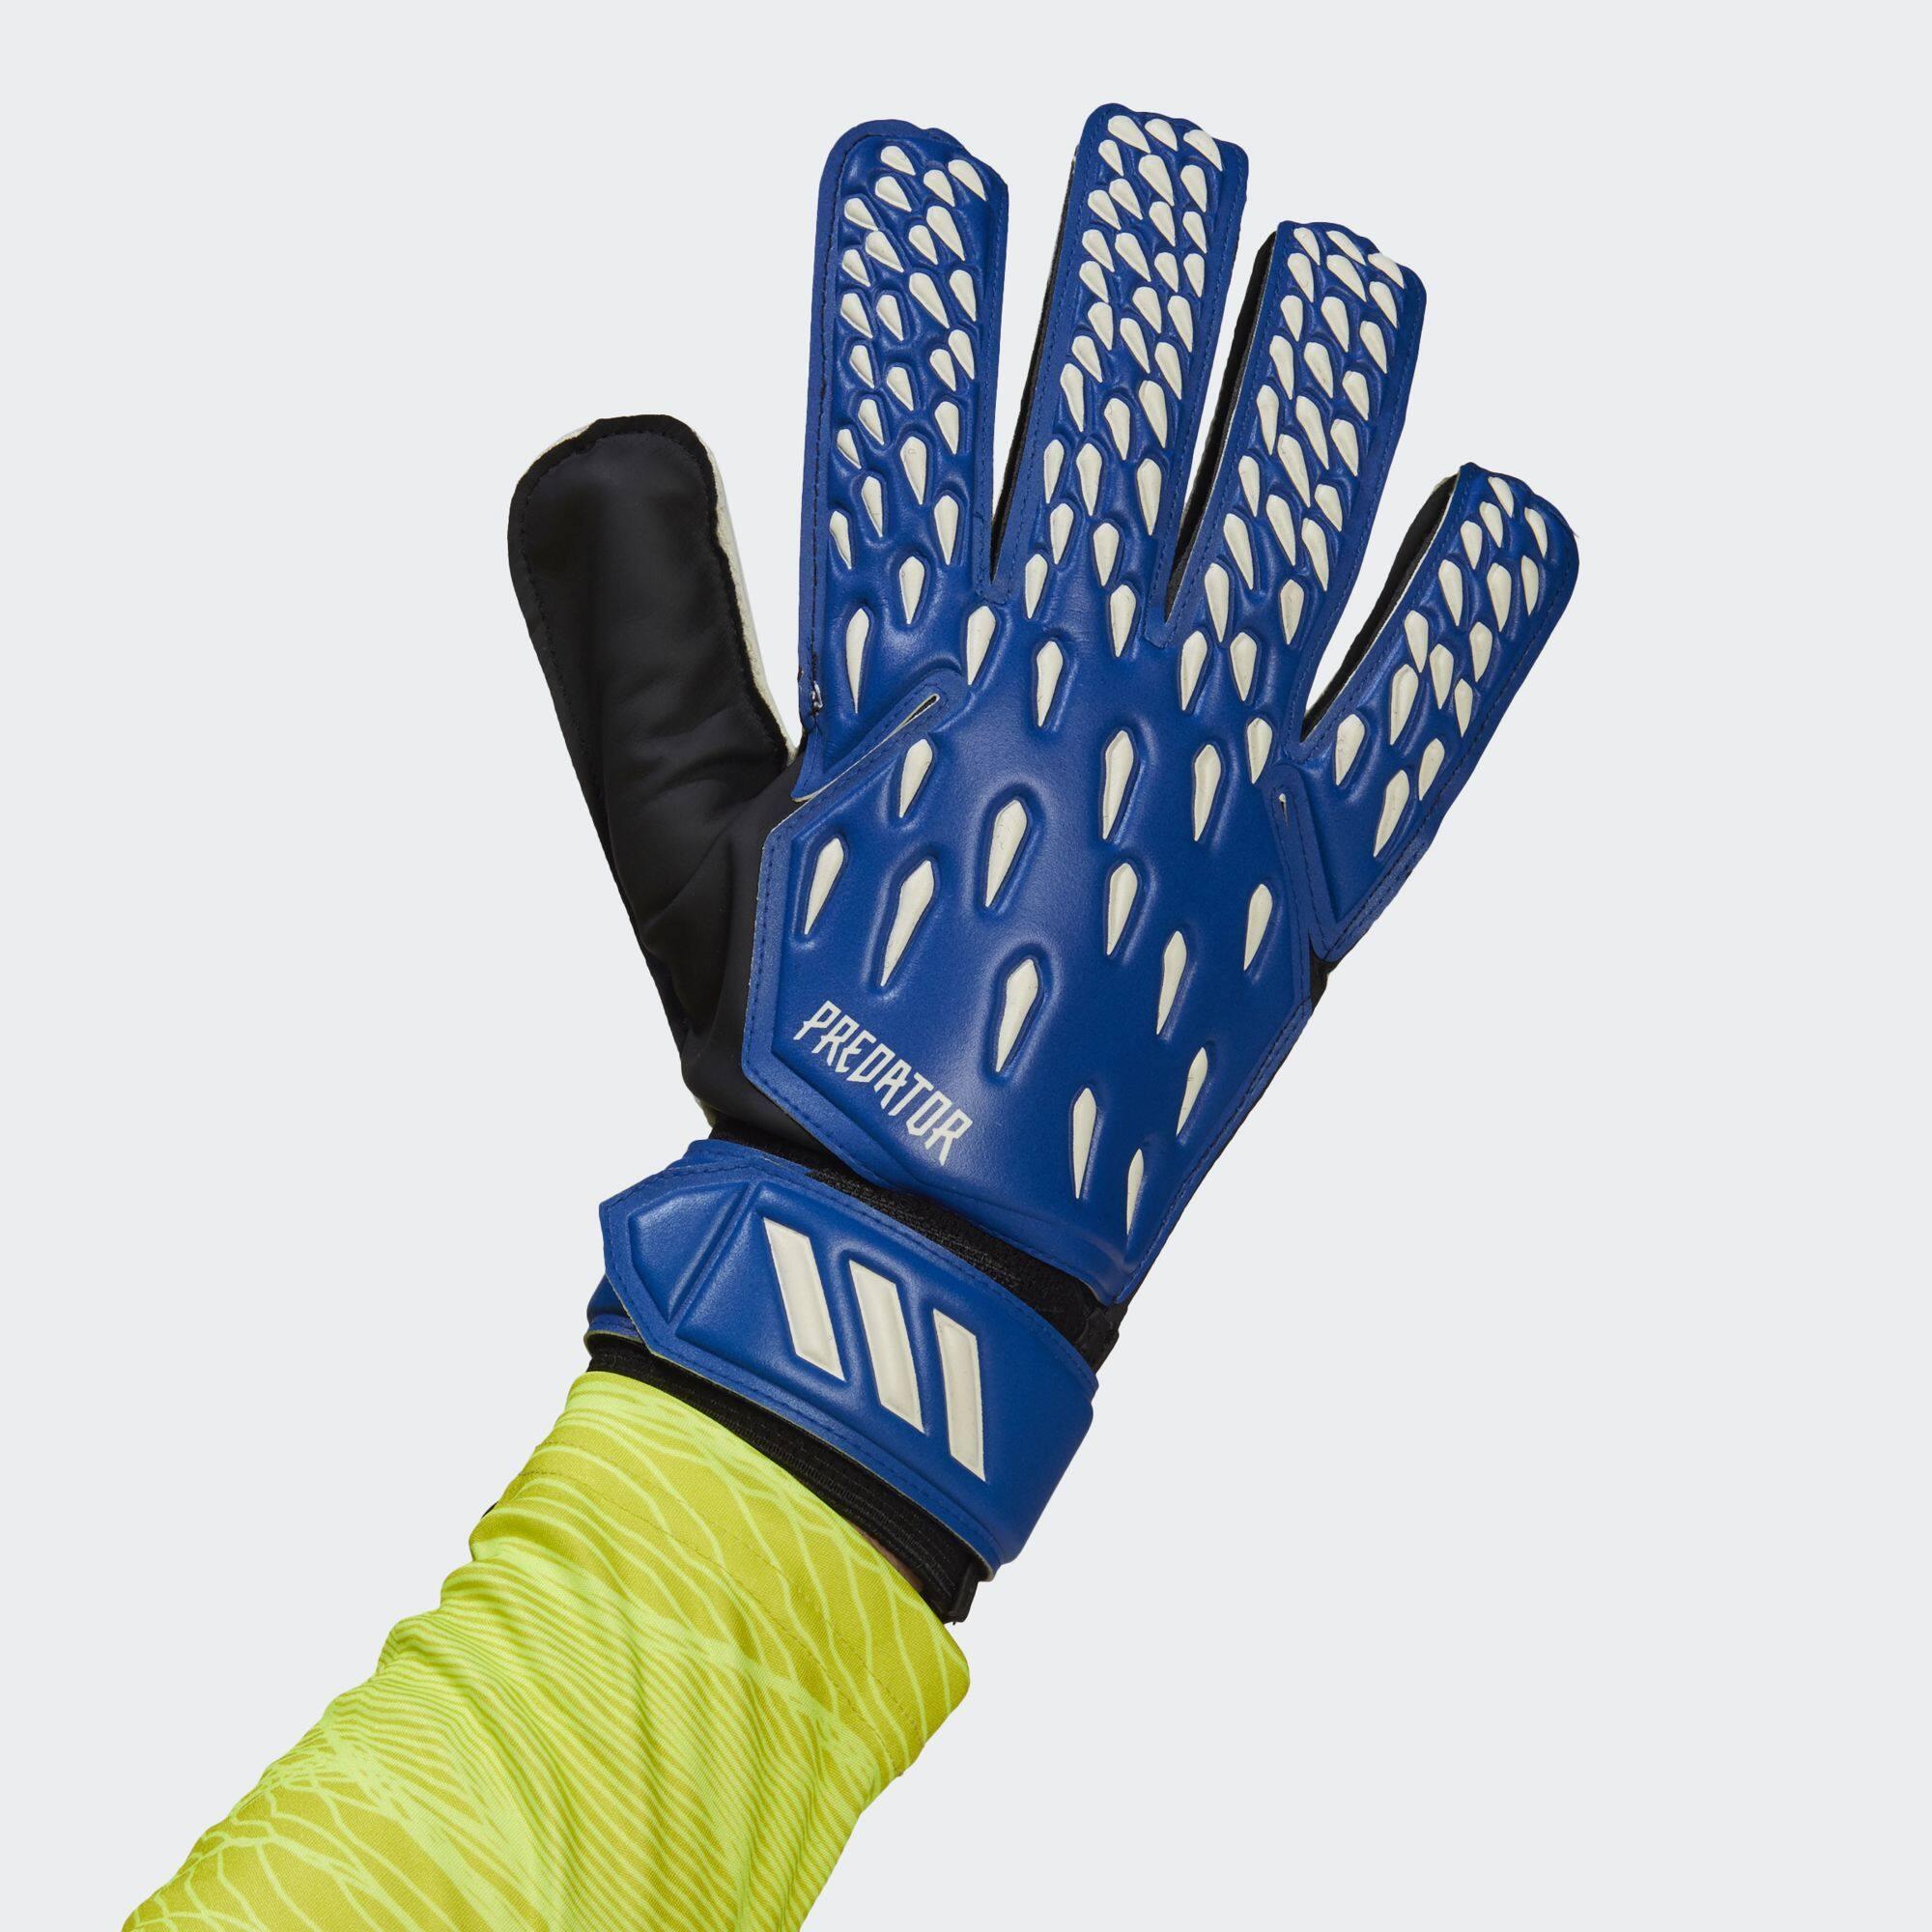 Adidas Football/soccer ถุงมือผู้รักษาประตู Predator สำหรับฝึกซ้อม ไม่ระบุเพศ Gk3524.